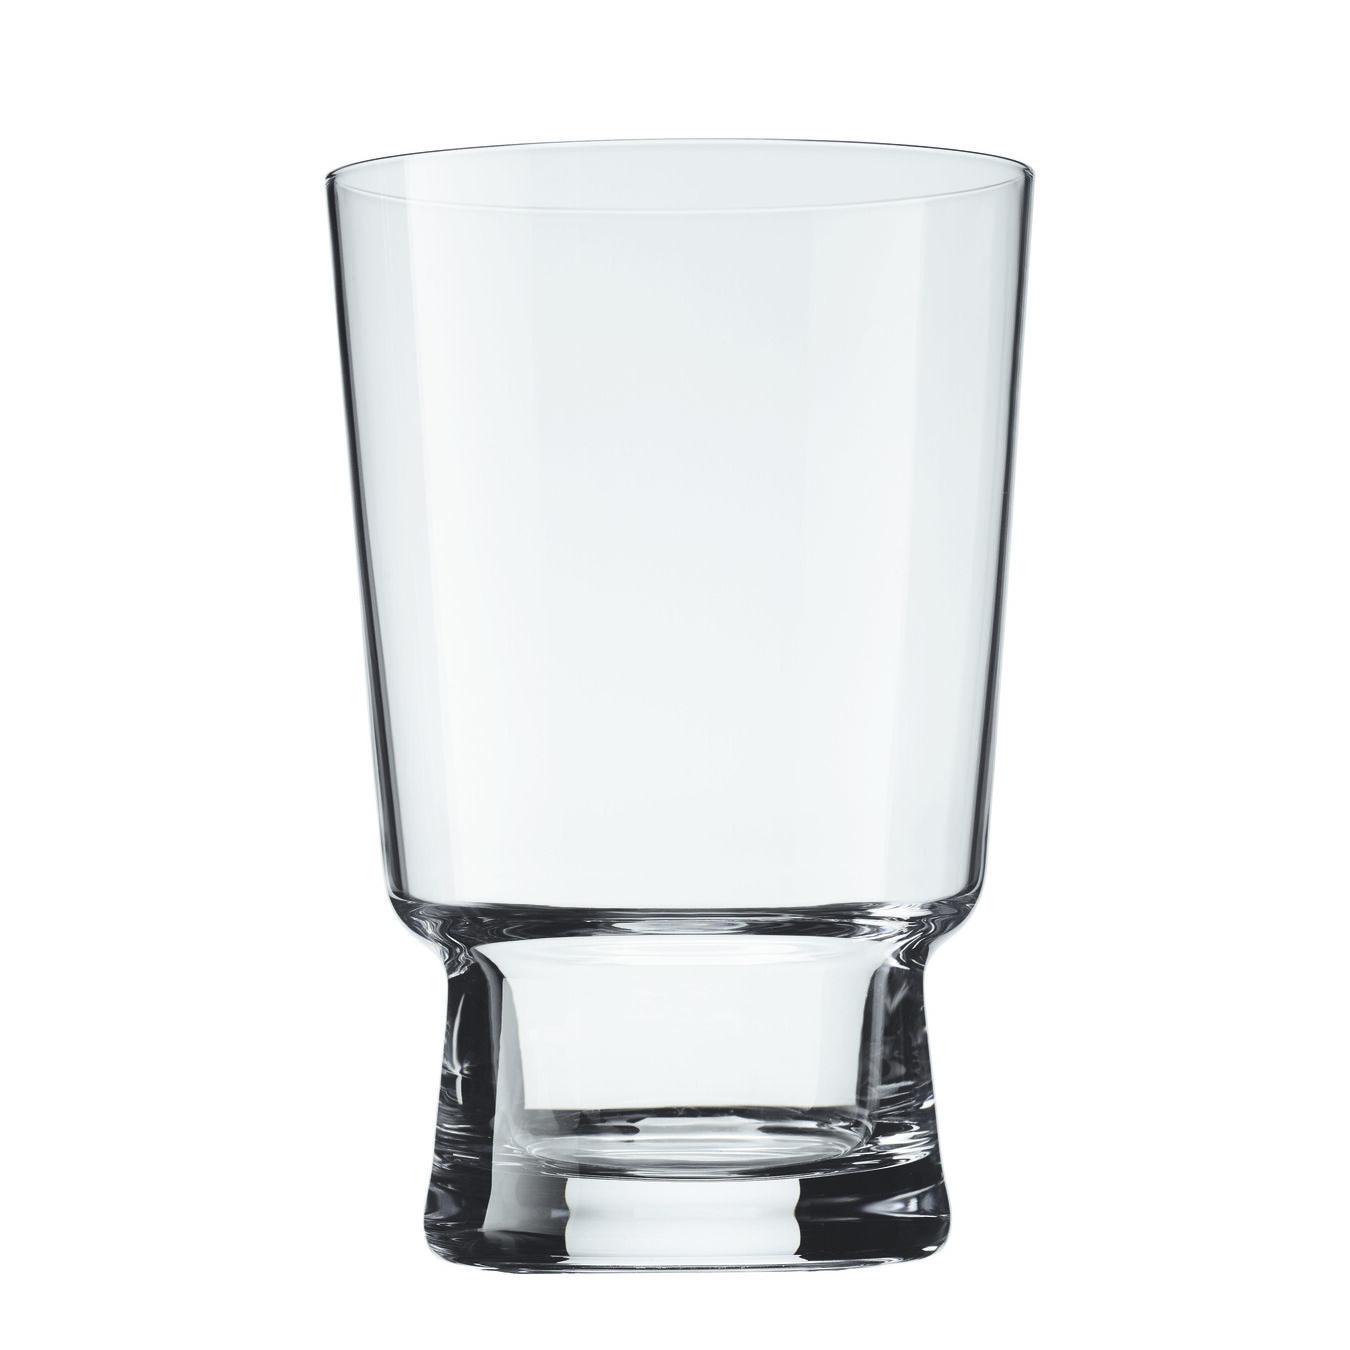 Copo para água e suco 450 ml,,large 1